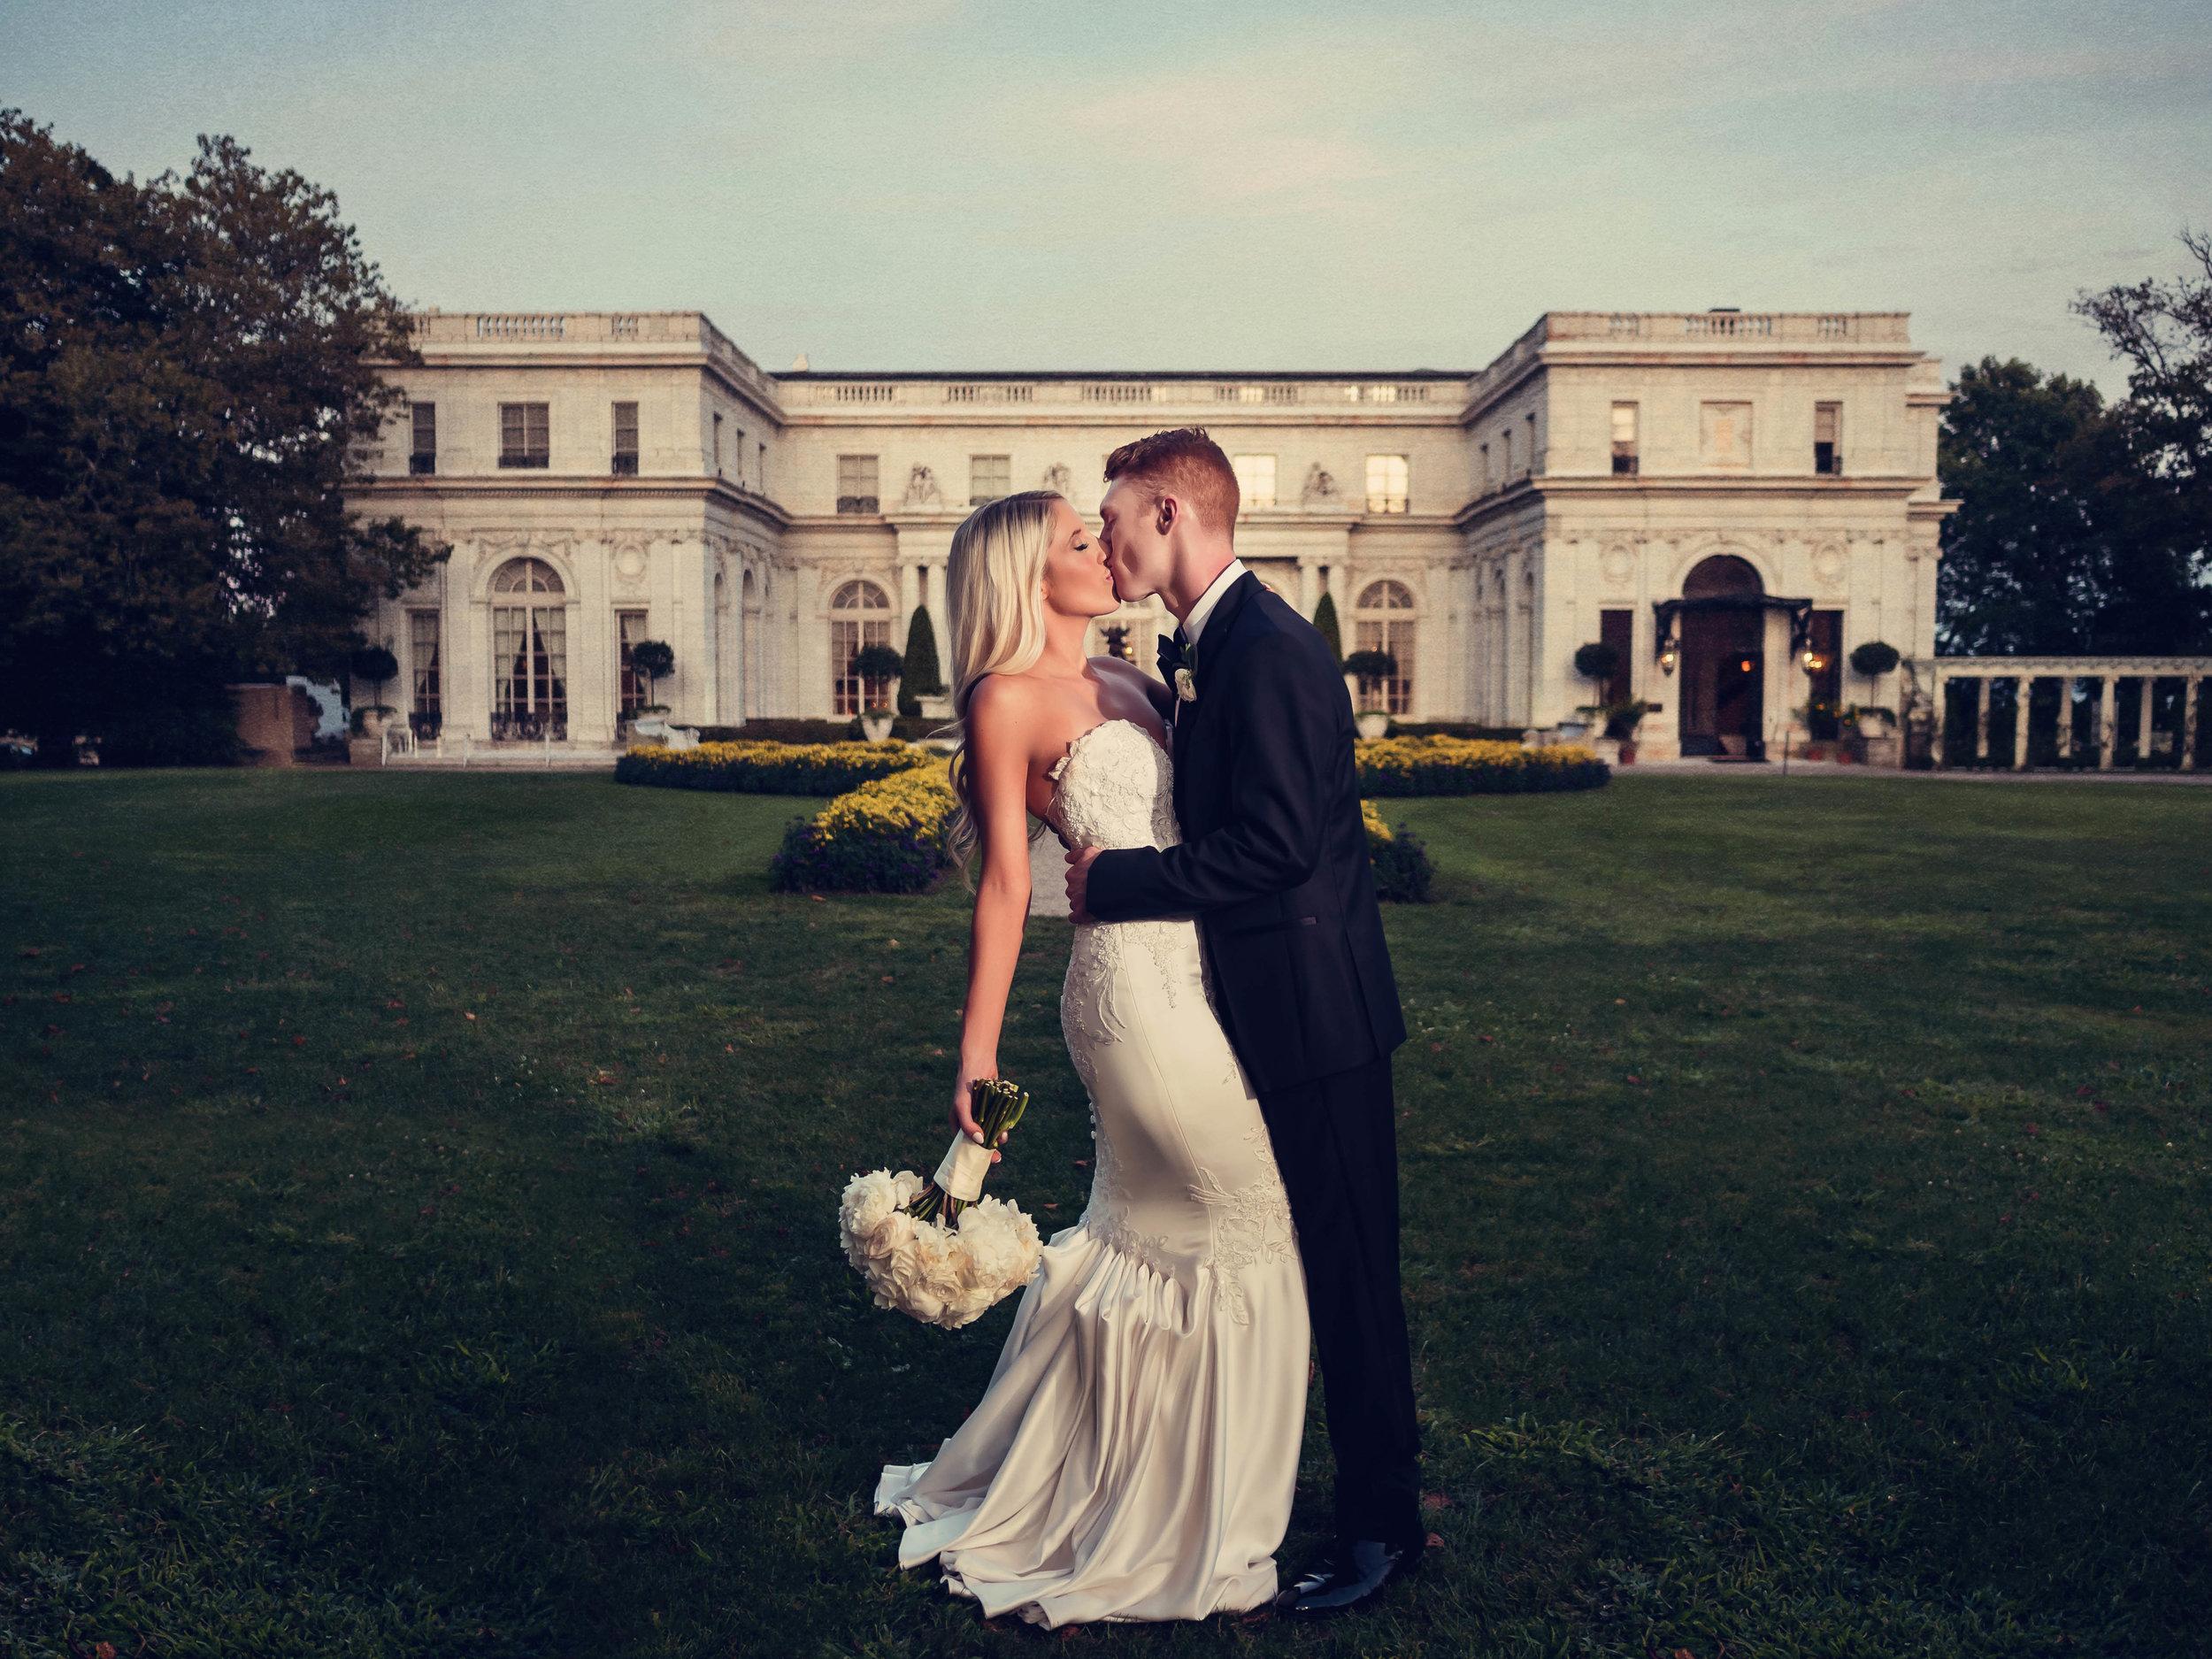 Kendra & Steve Rosecliff Mansion Wedding Newport Rhode Island